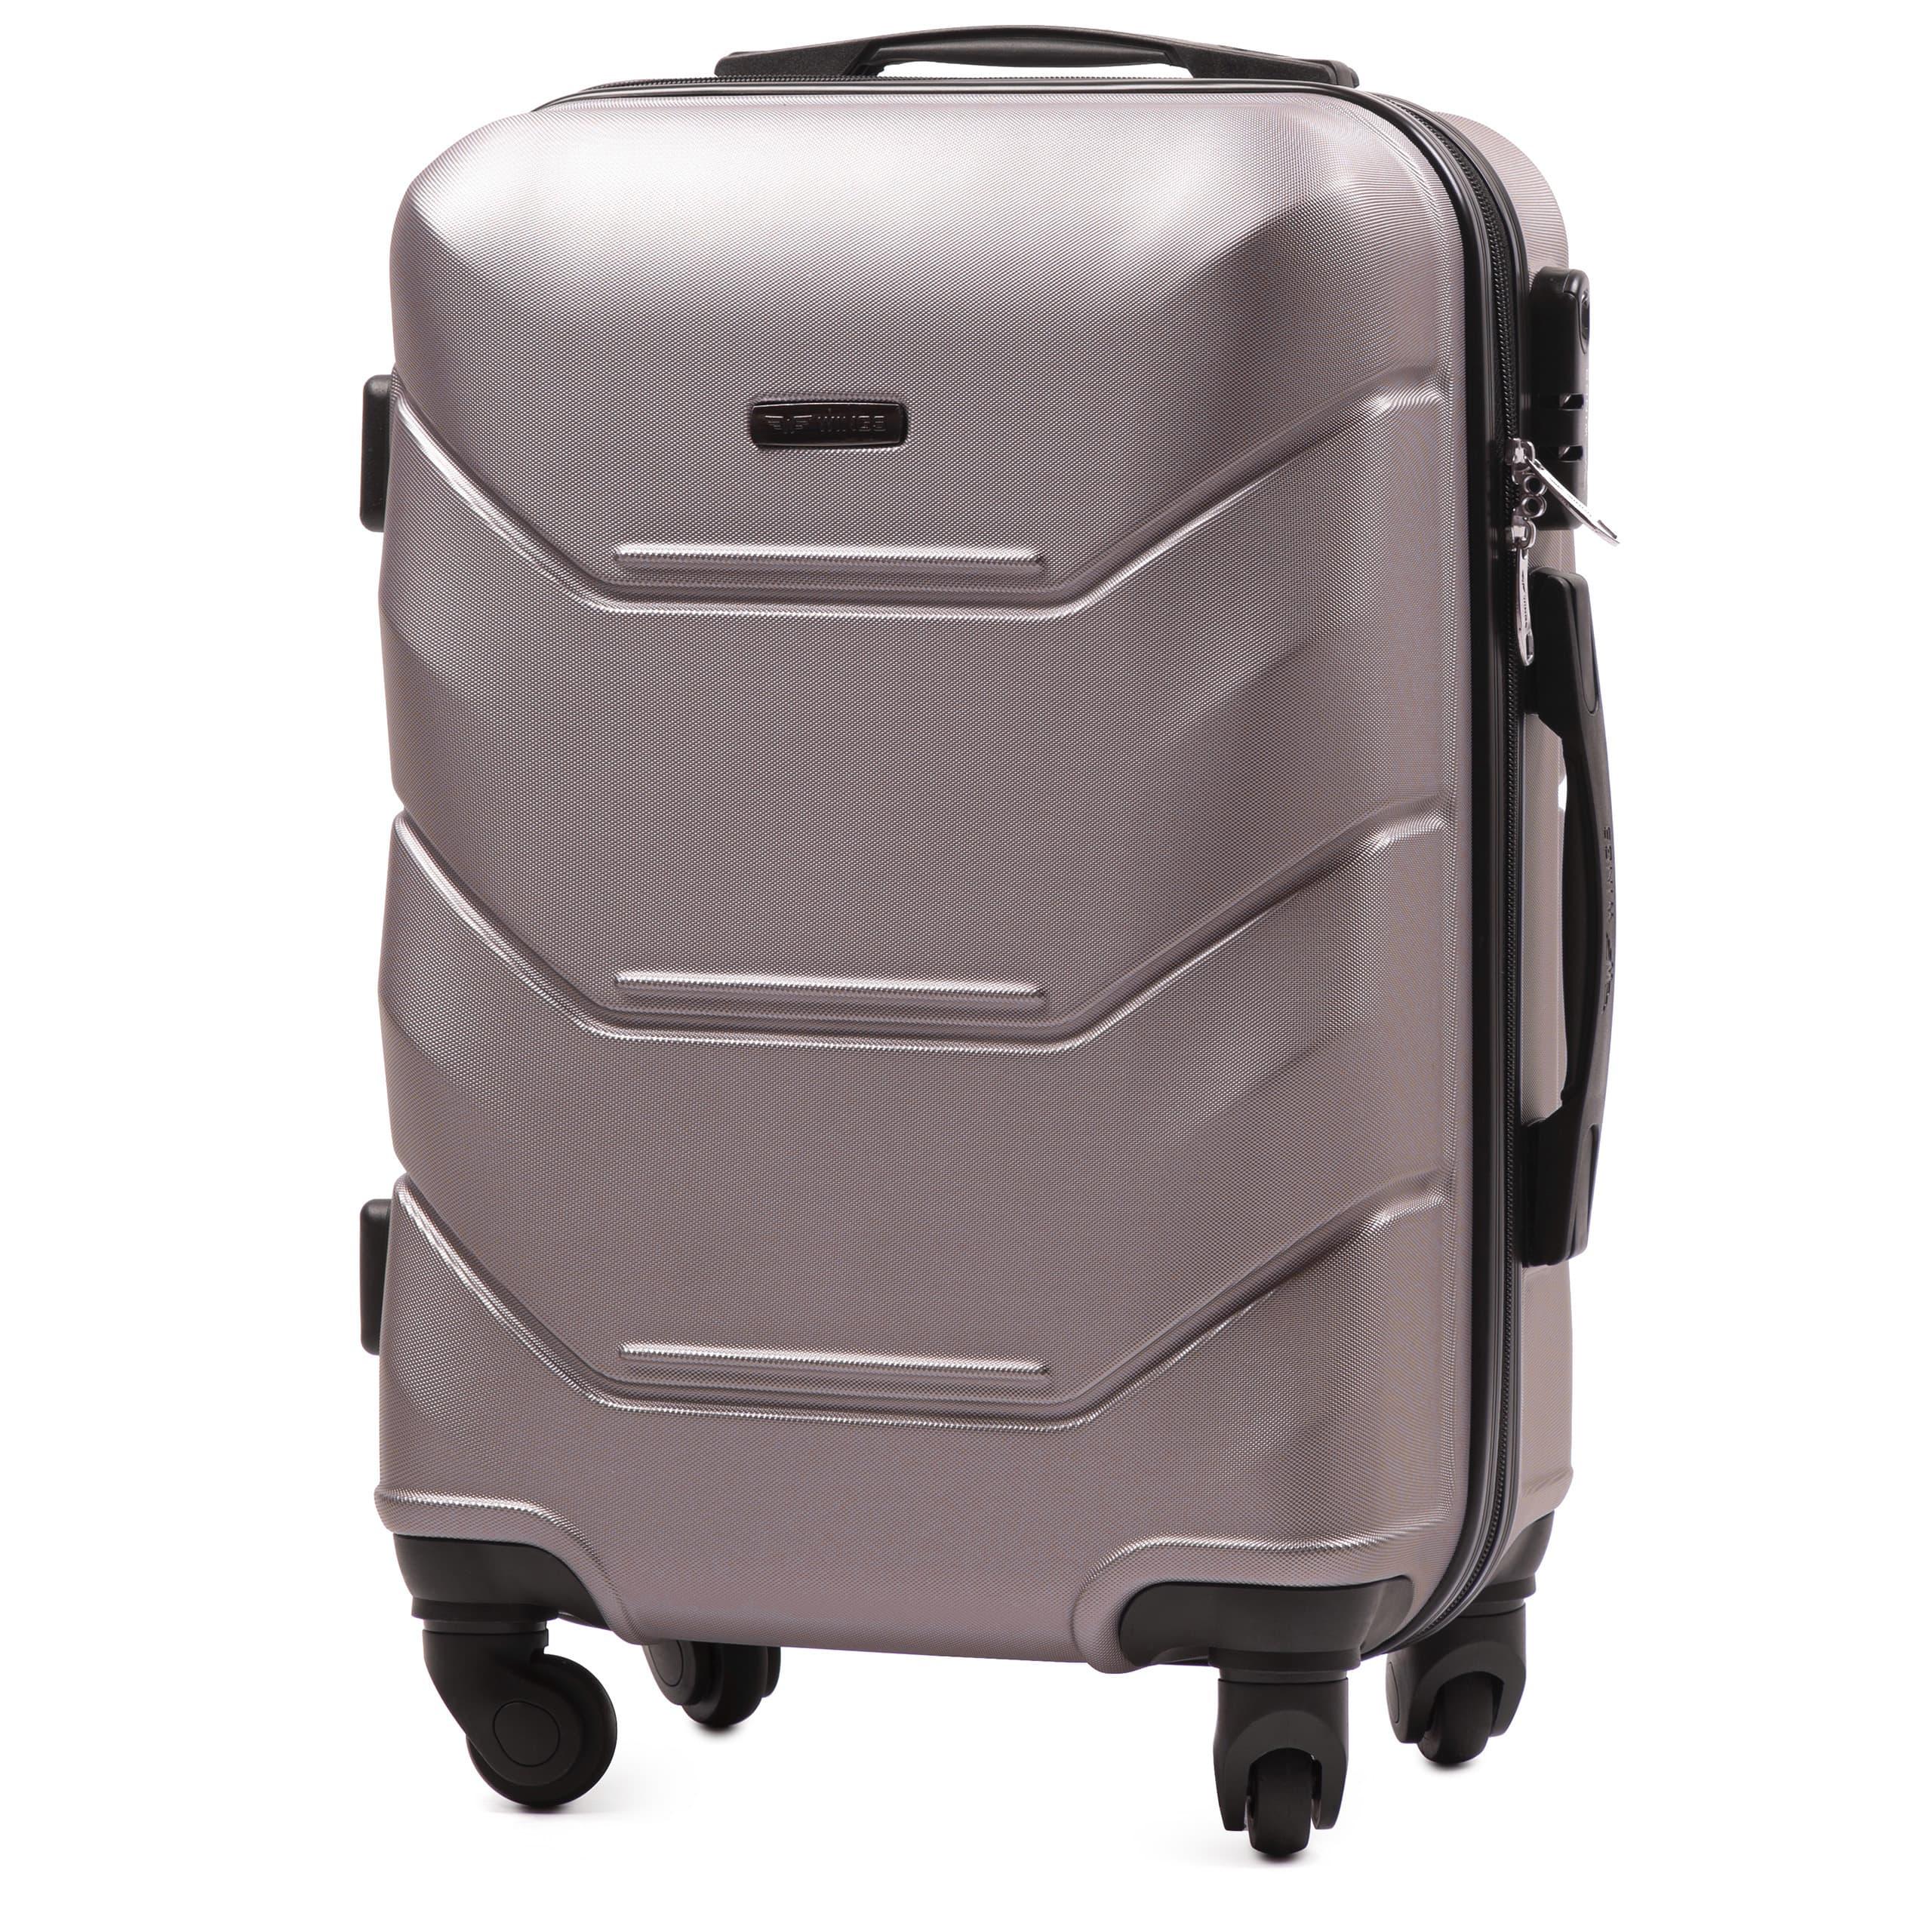 Valiza mica WINGS 147 S ROSE-GOLD  Premium pe 4 roti din cauciuc!Pt bagaj de maina,7/10 kg